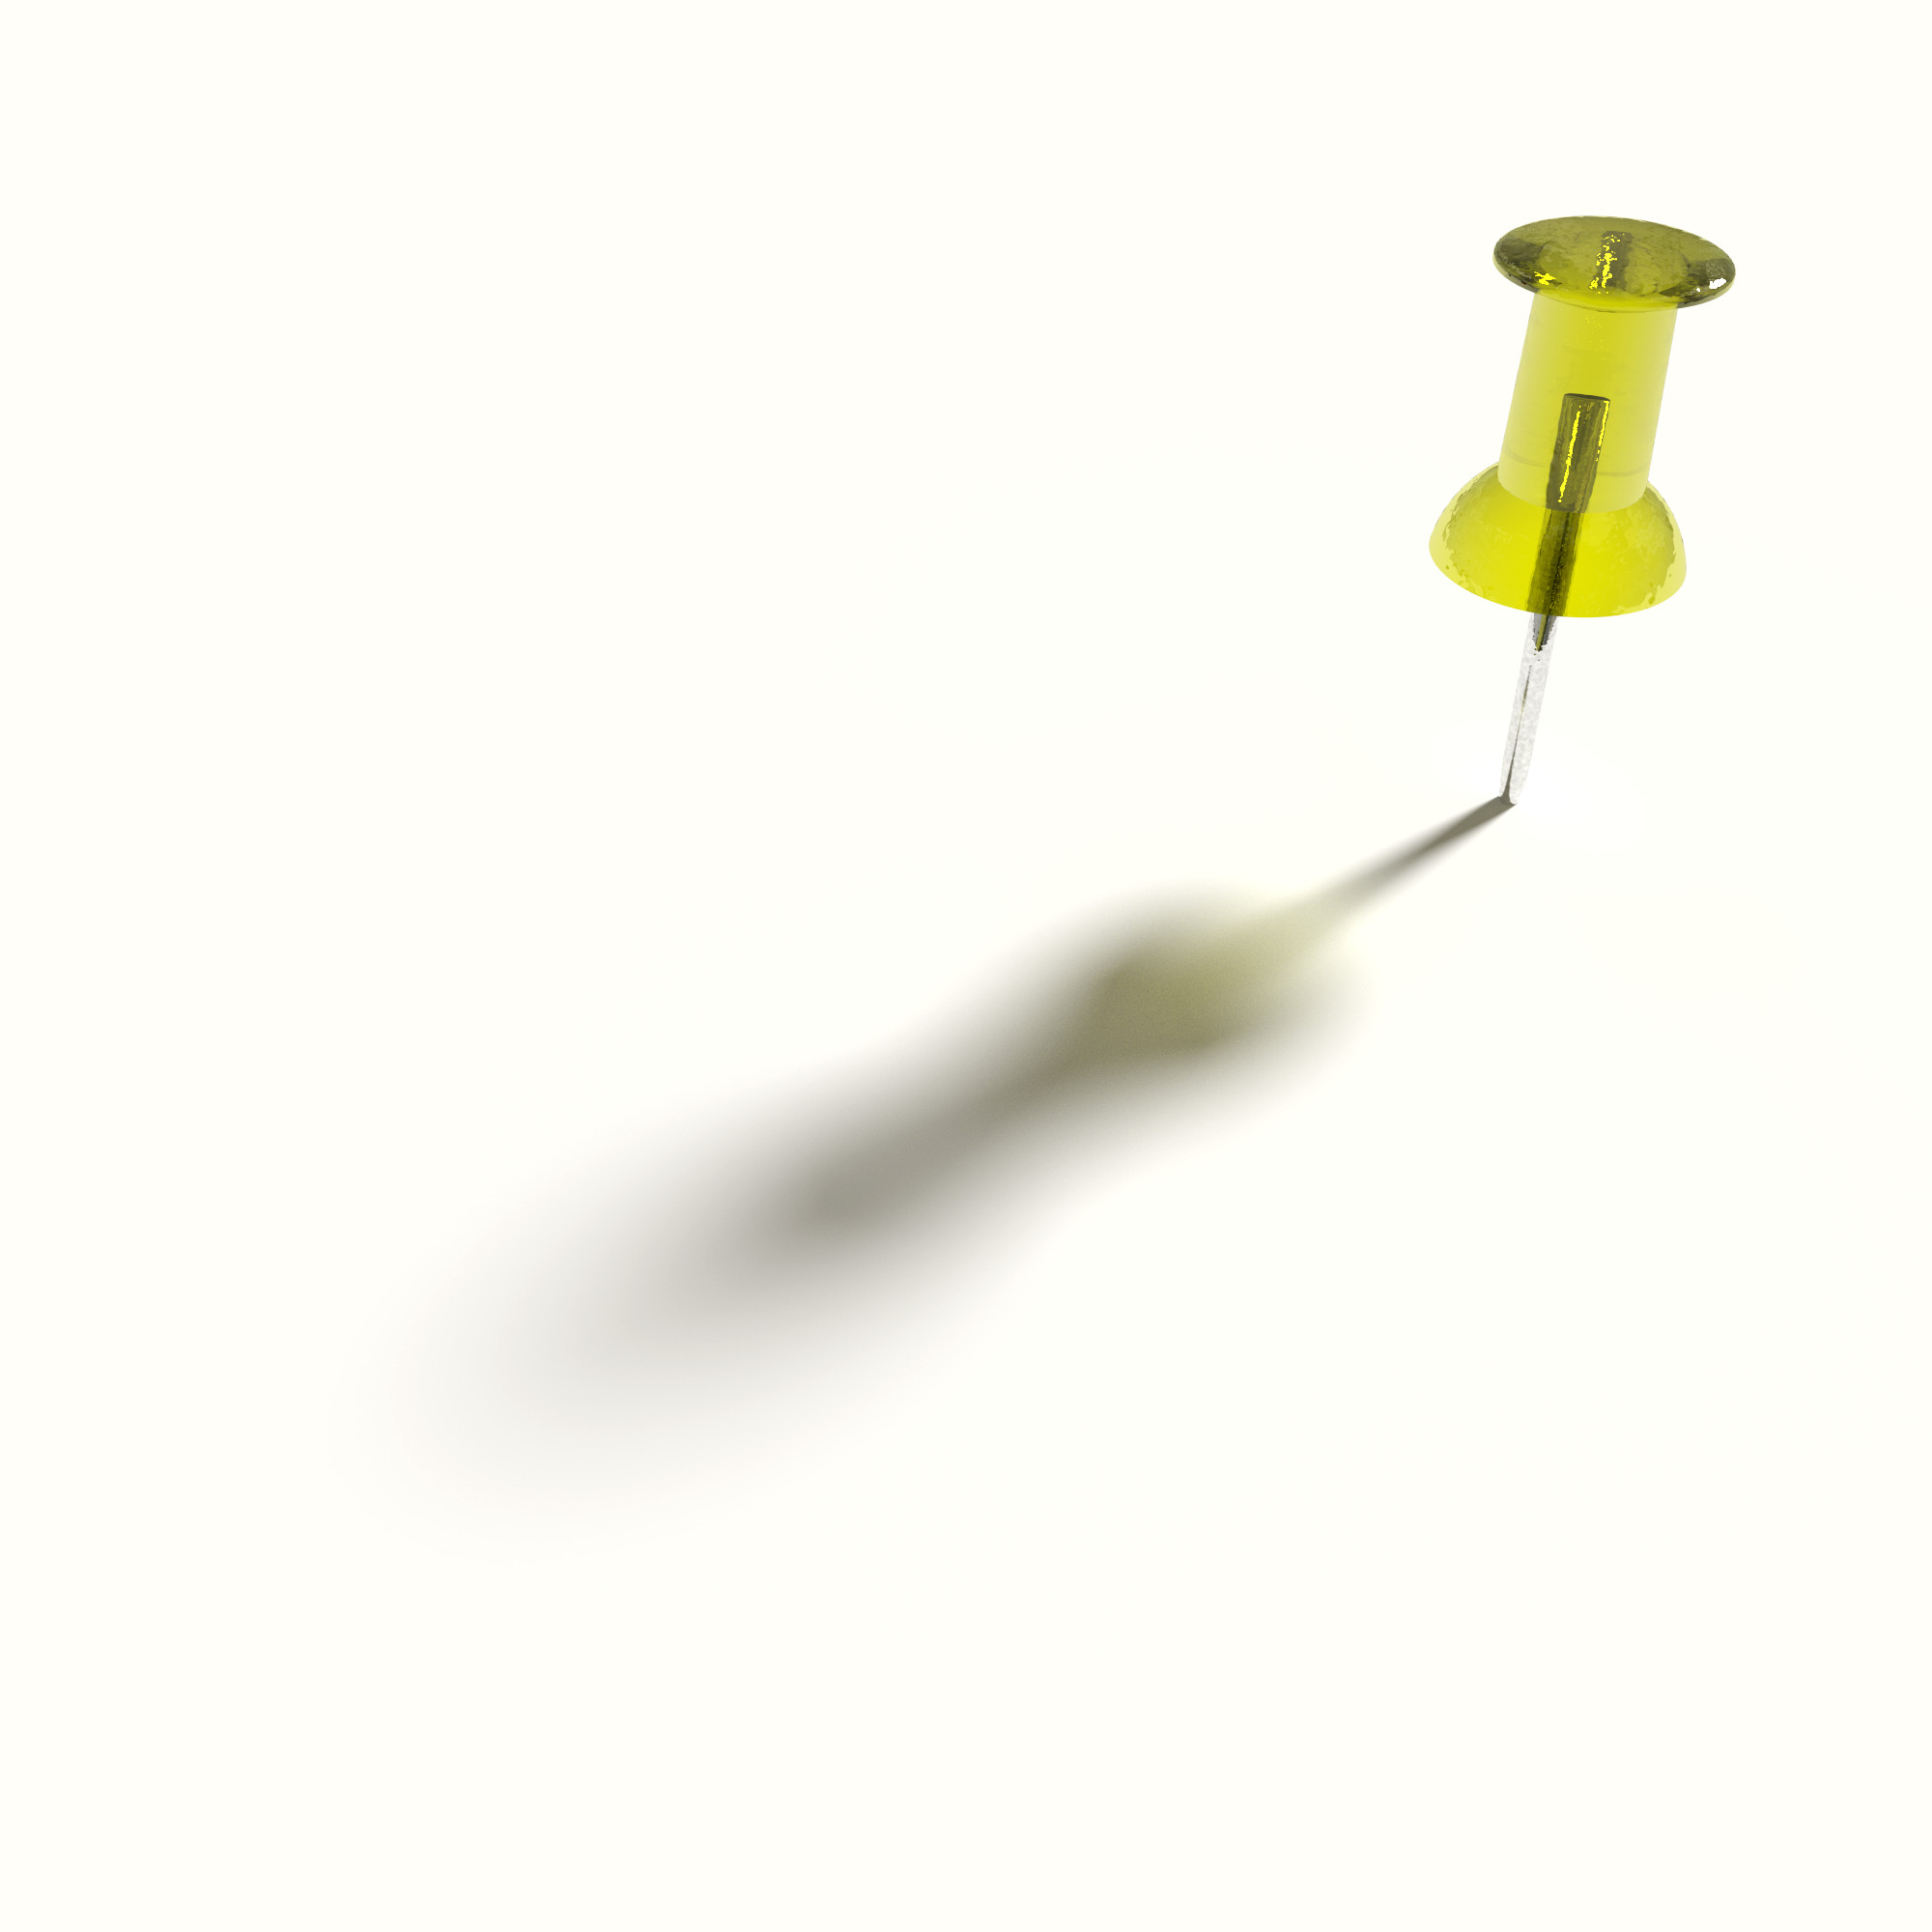 file yellow push pin jpg wikimedia commons